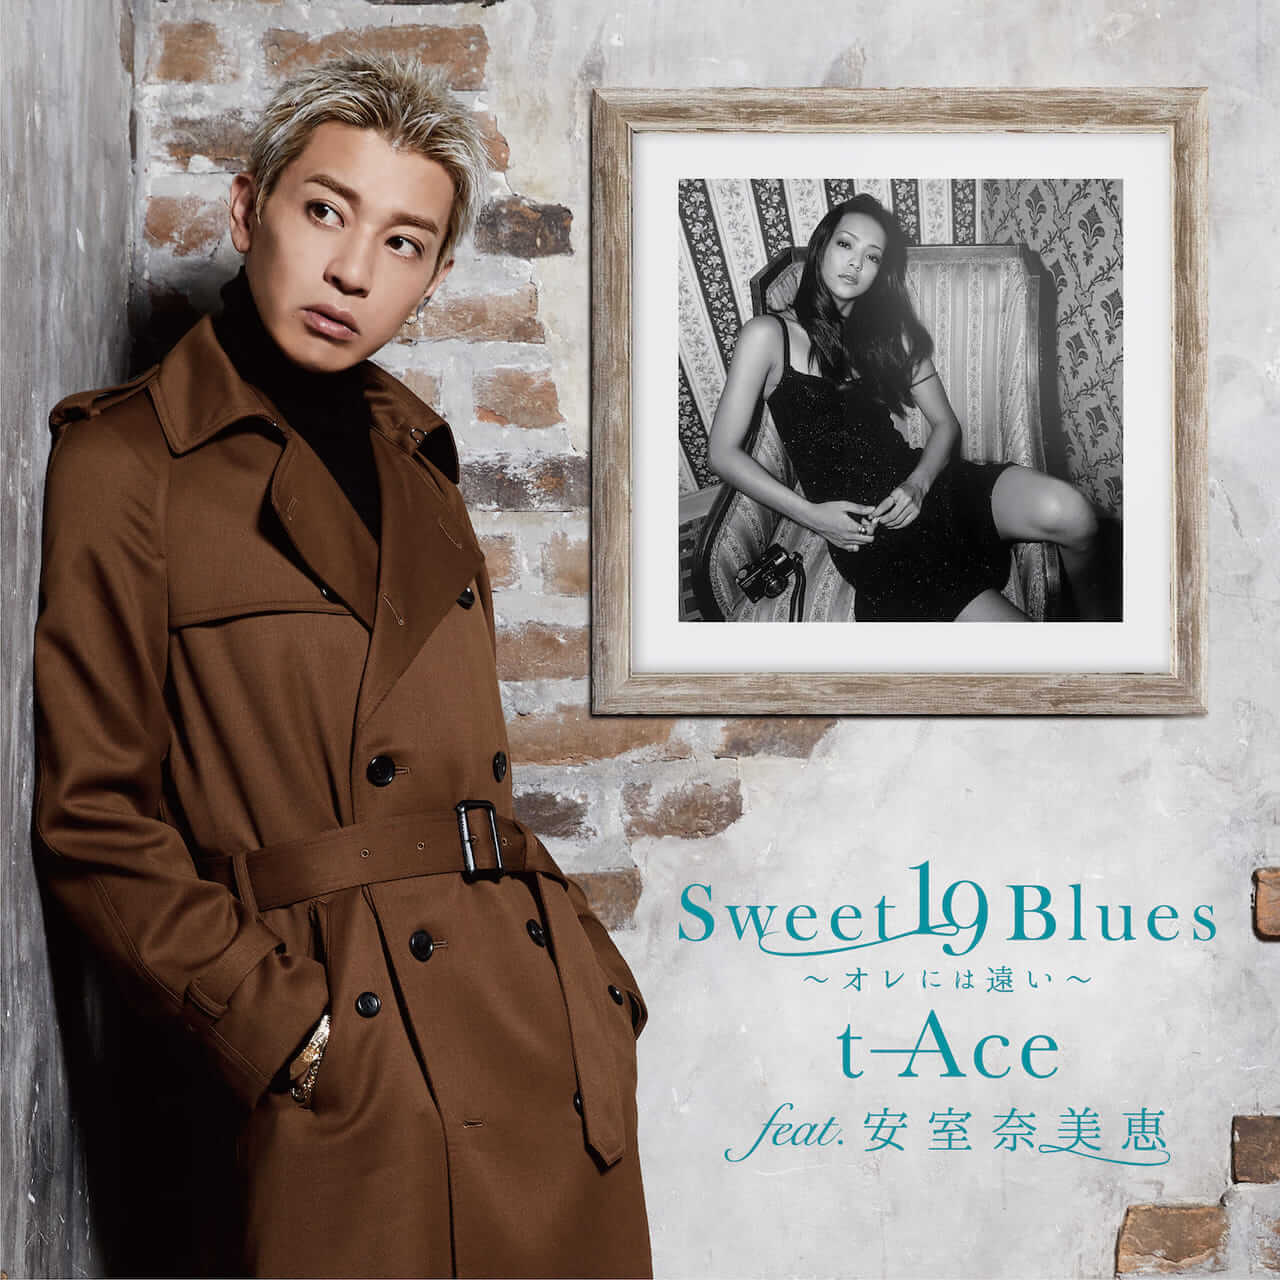 「Sweet 19 Blues ~オレには遠い~ (feat. 安室奈美恵)」t-Ace